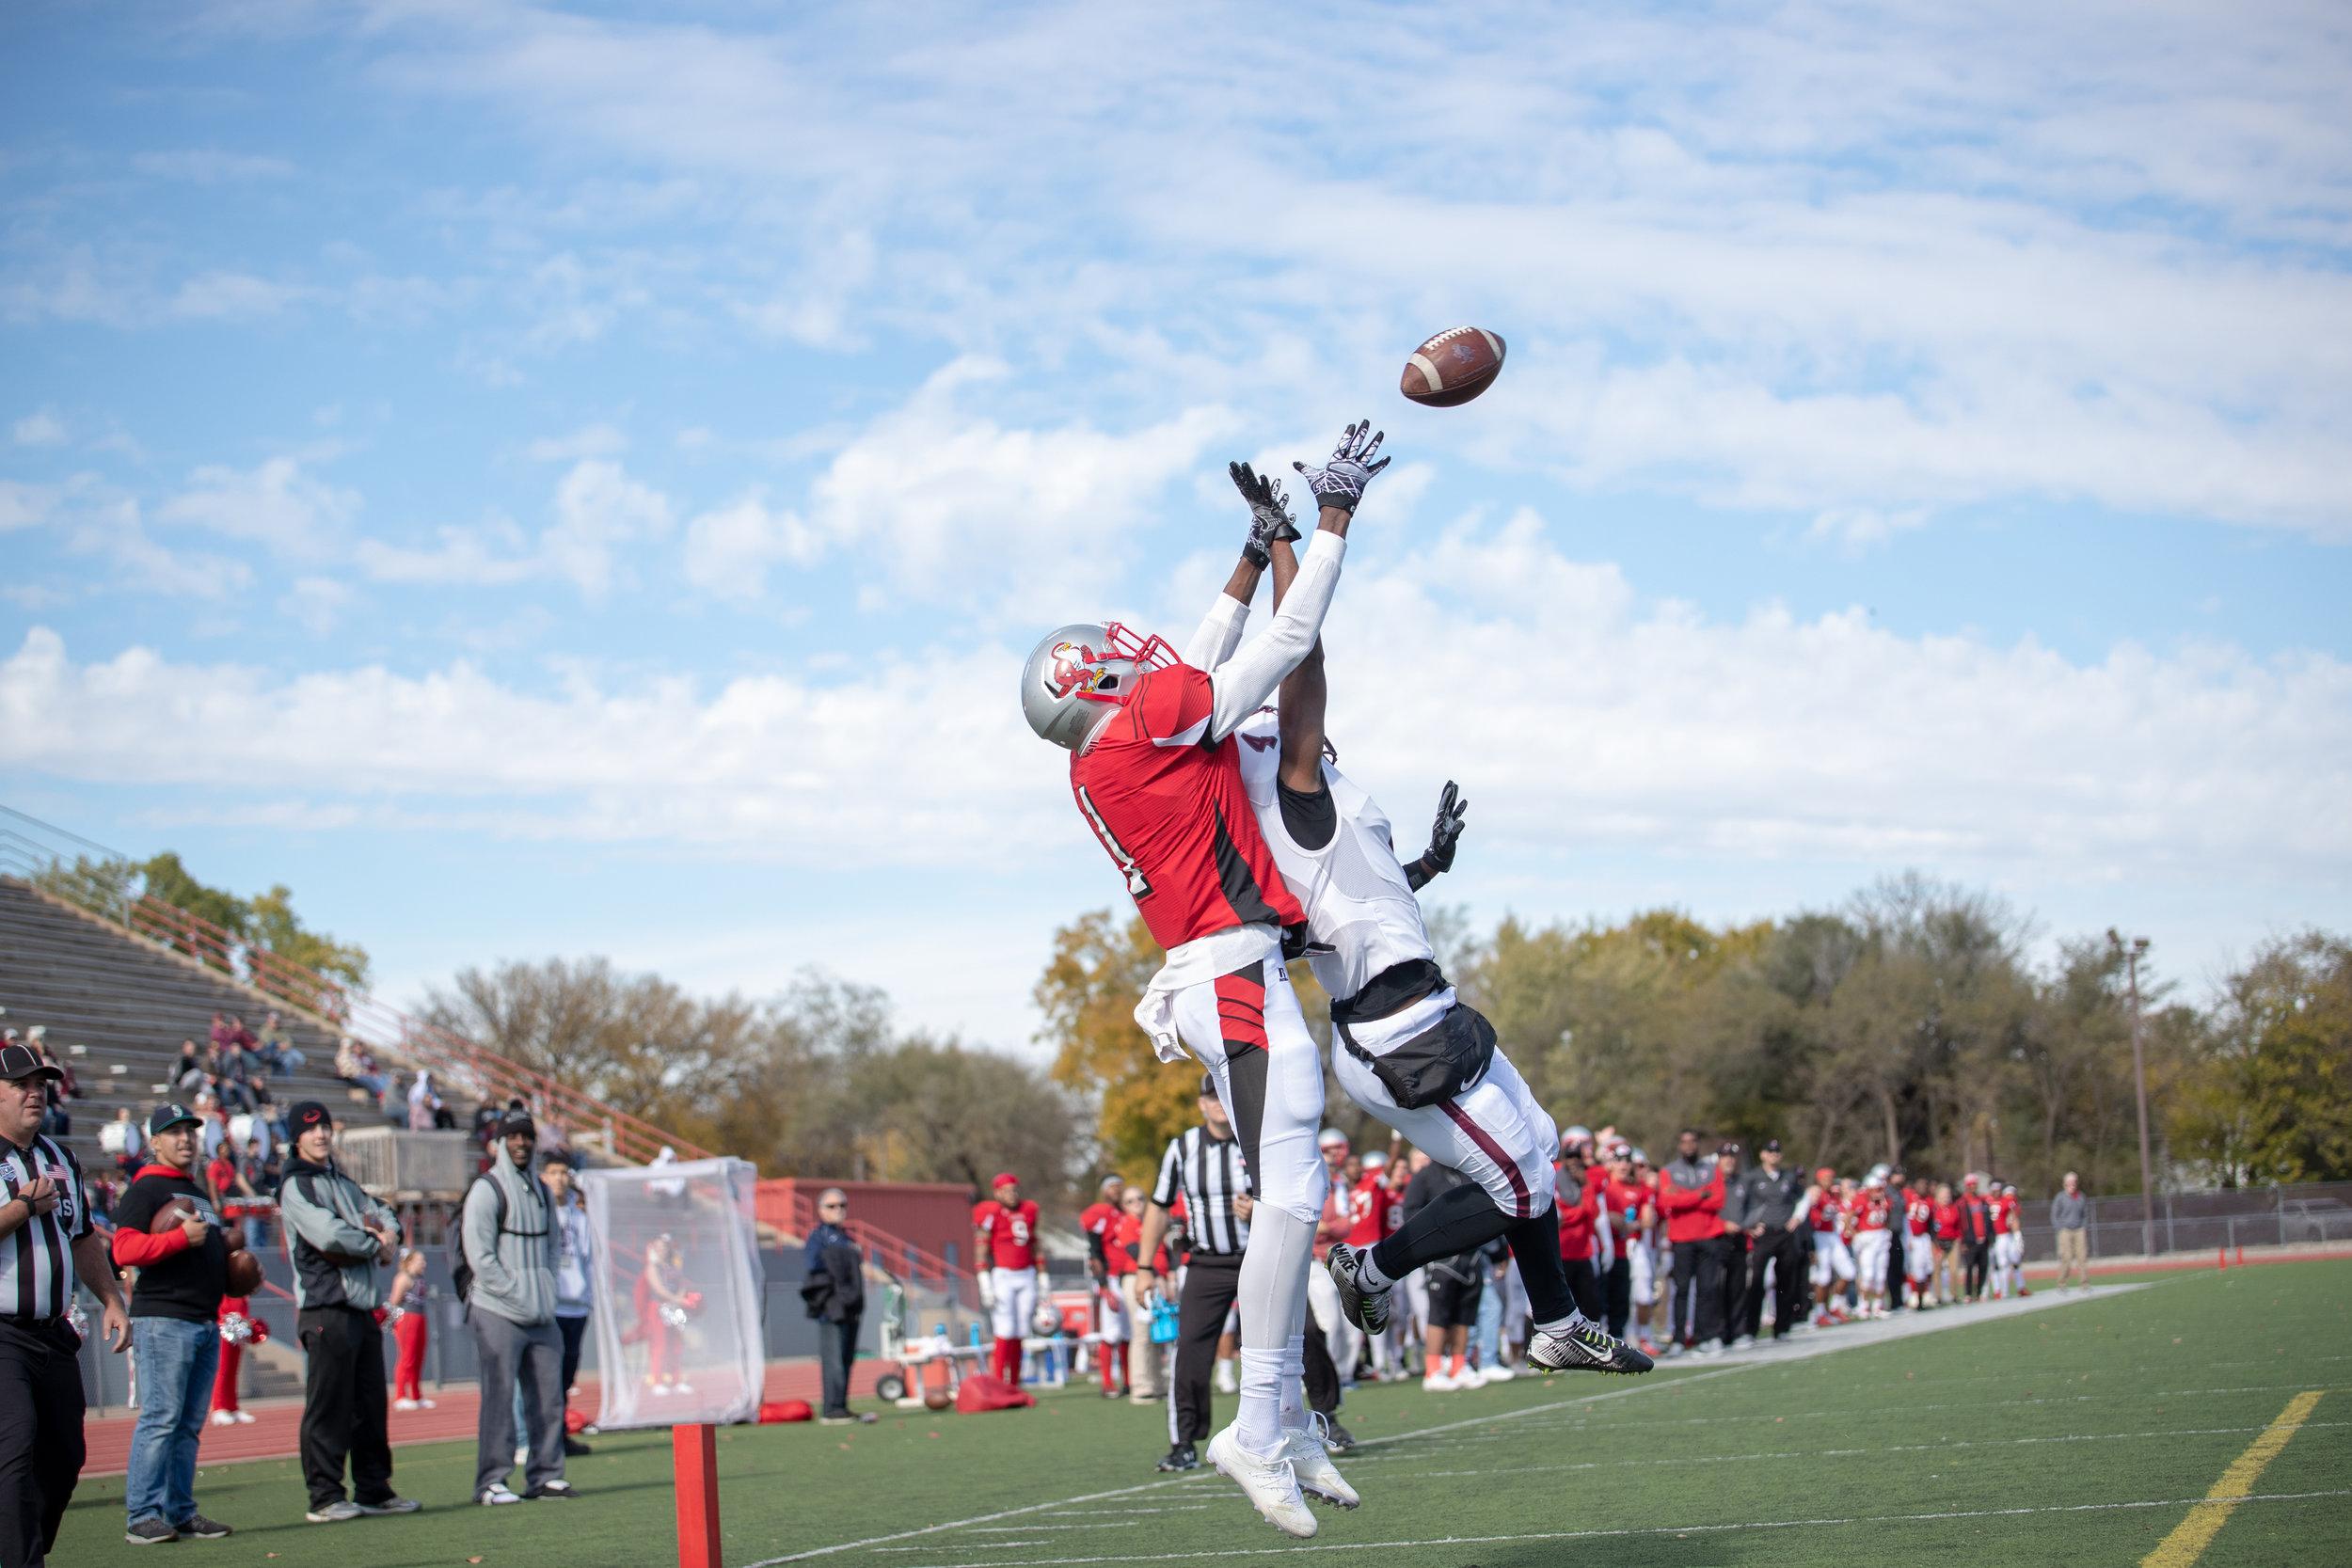 Friends University won their game against Bethel College on Nov. 3, 2018 in Wichita, KS.